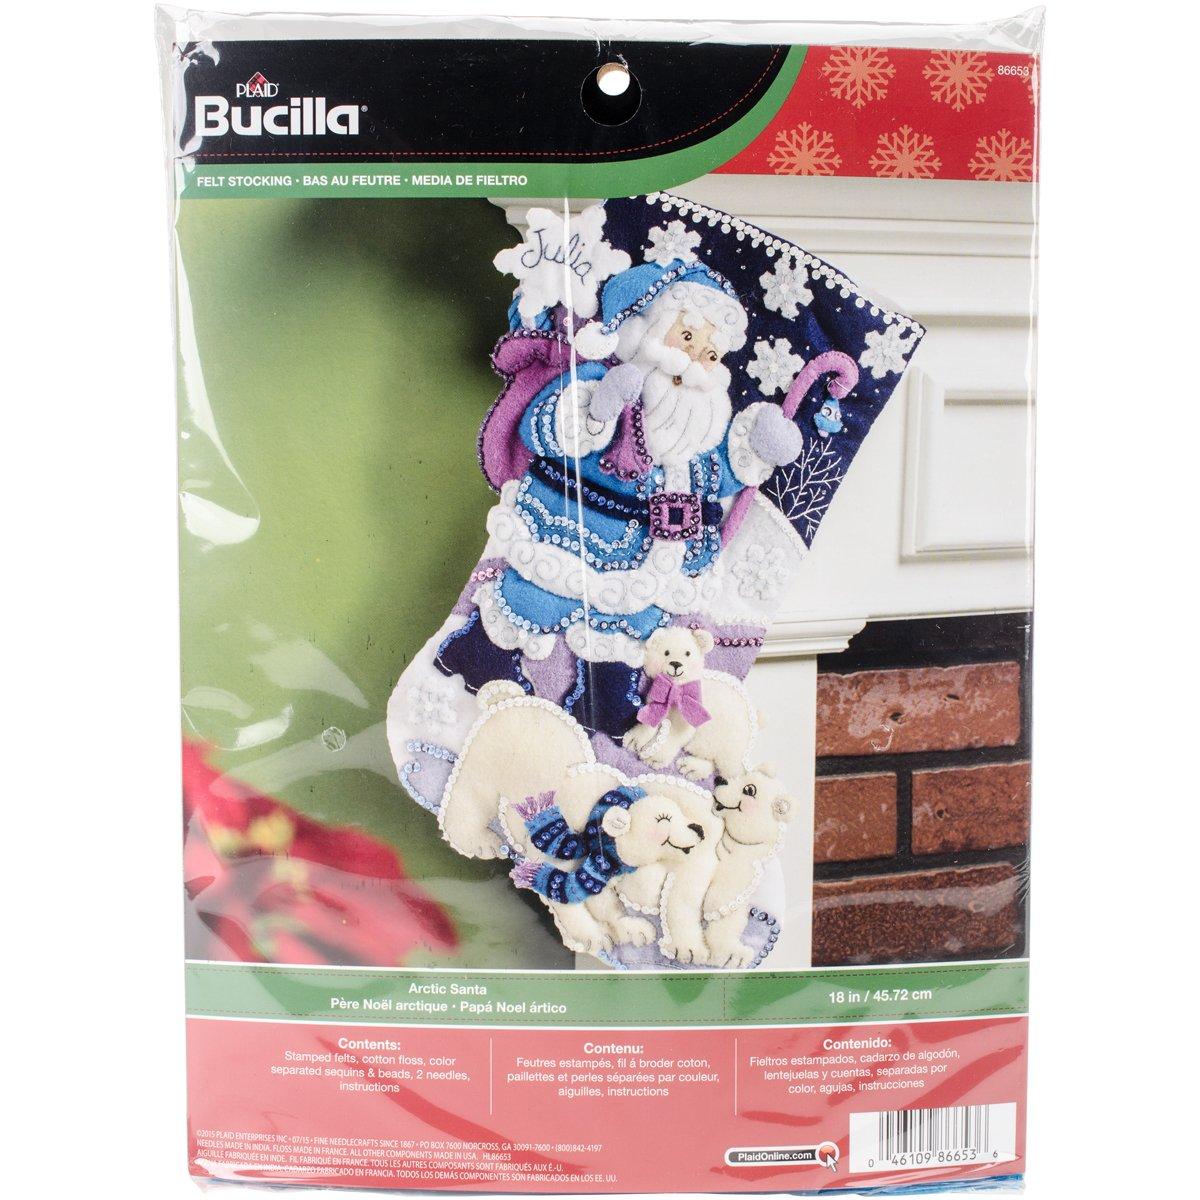 Bucilla 18-Inch Christmas Stocking Felt Applique Kit, 86653 Arctic Santa Plaid Inc dimensions needlecrafts holiday stitchery